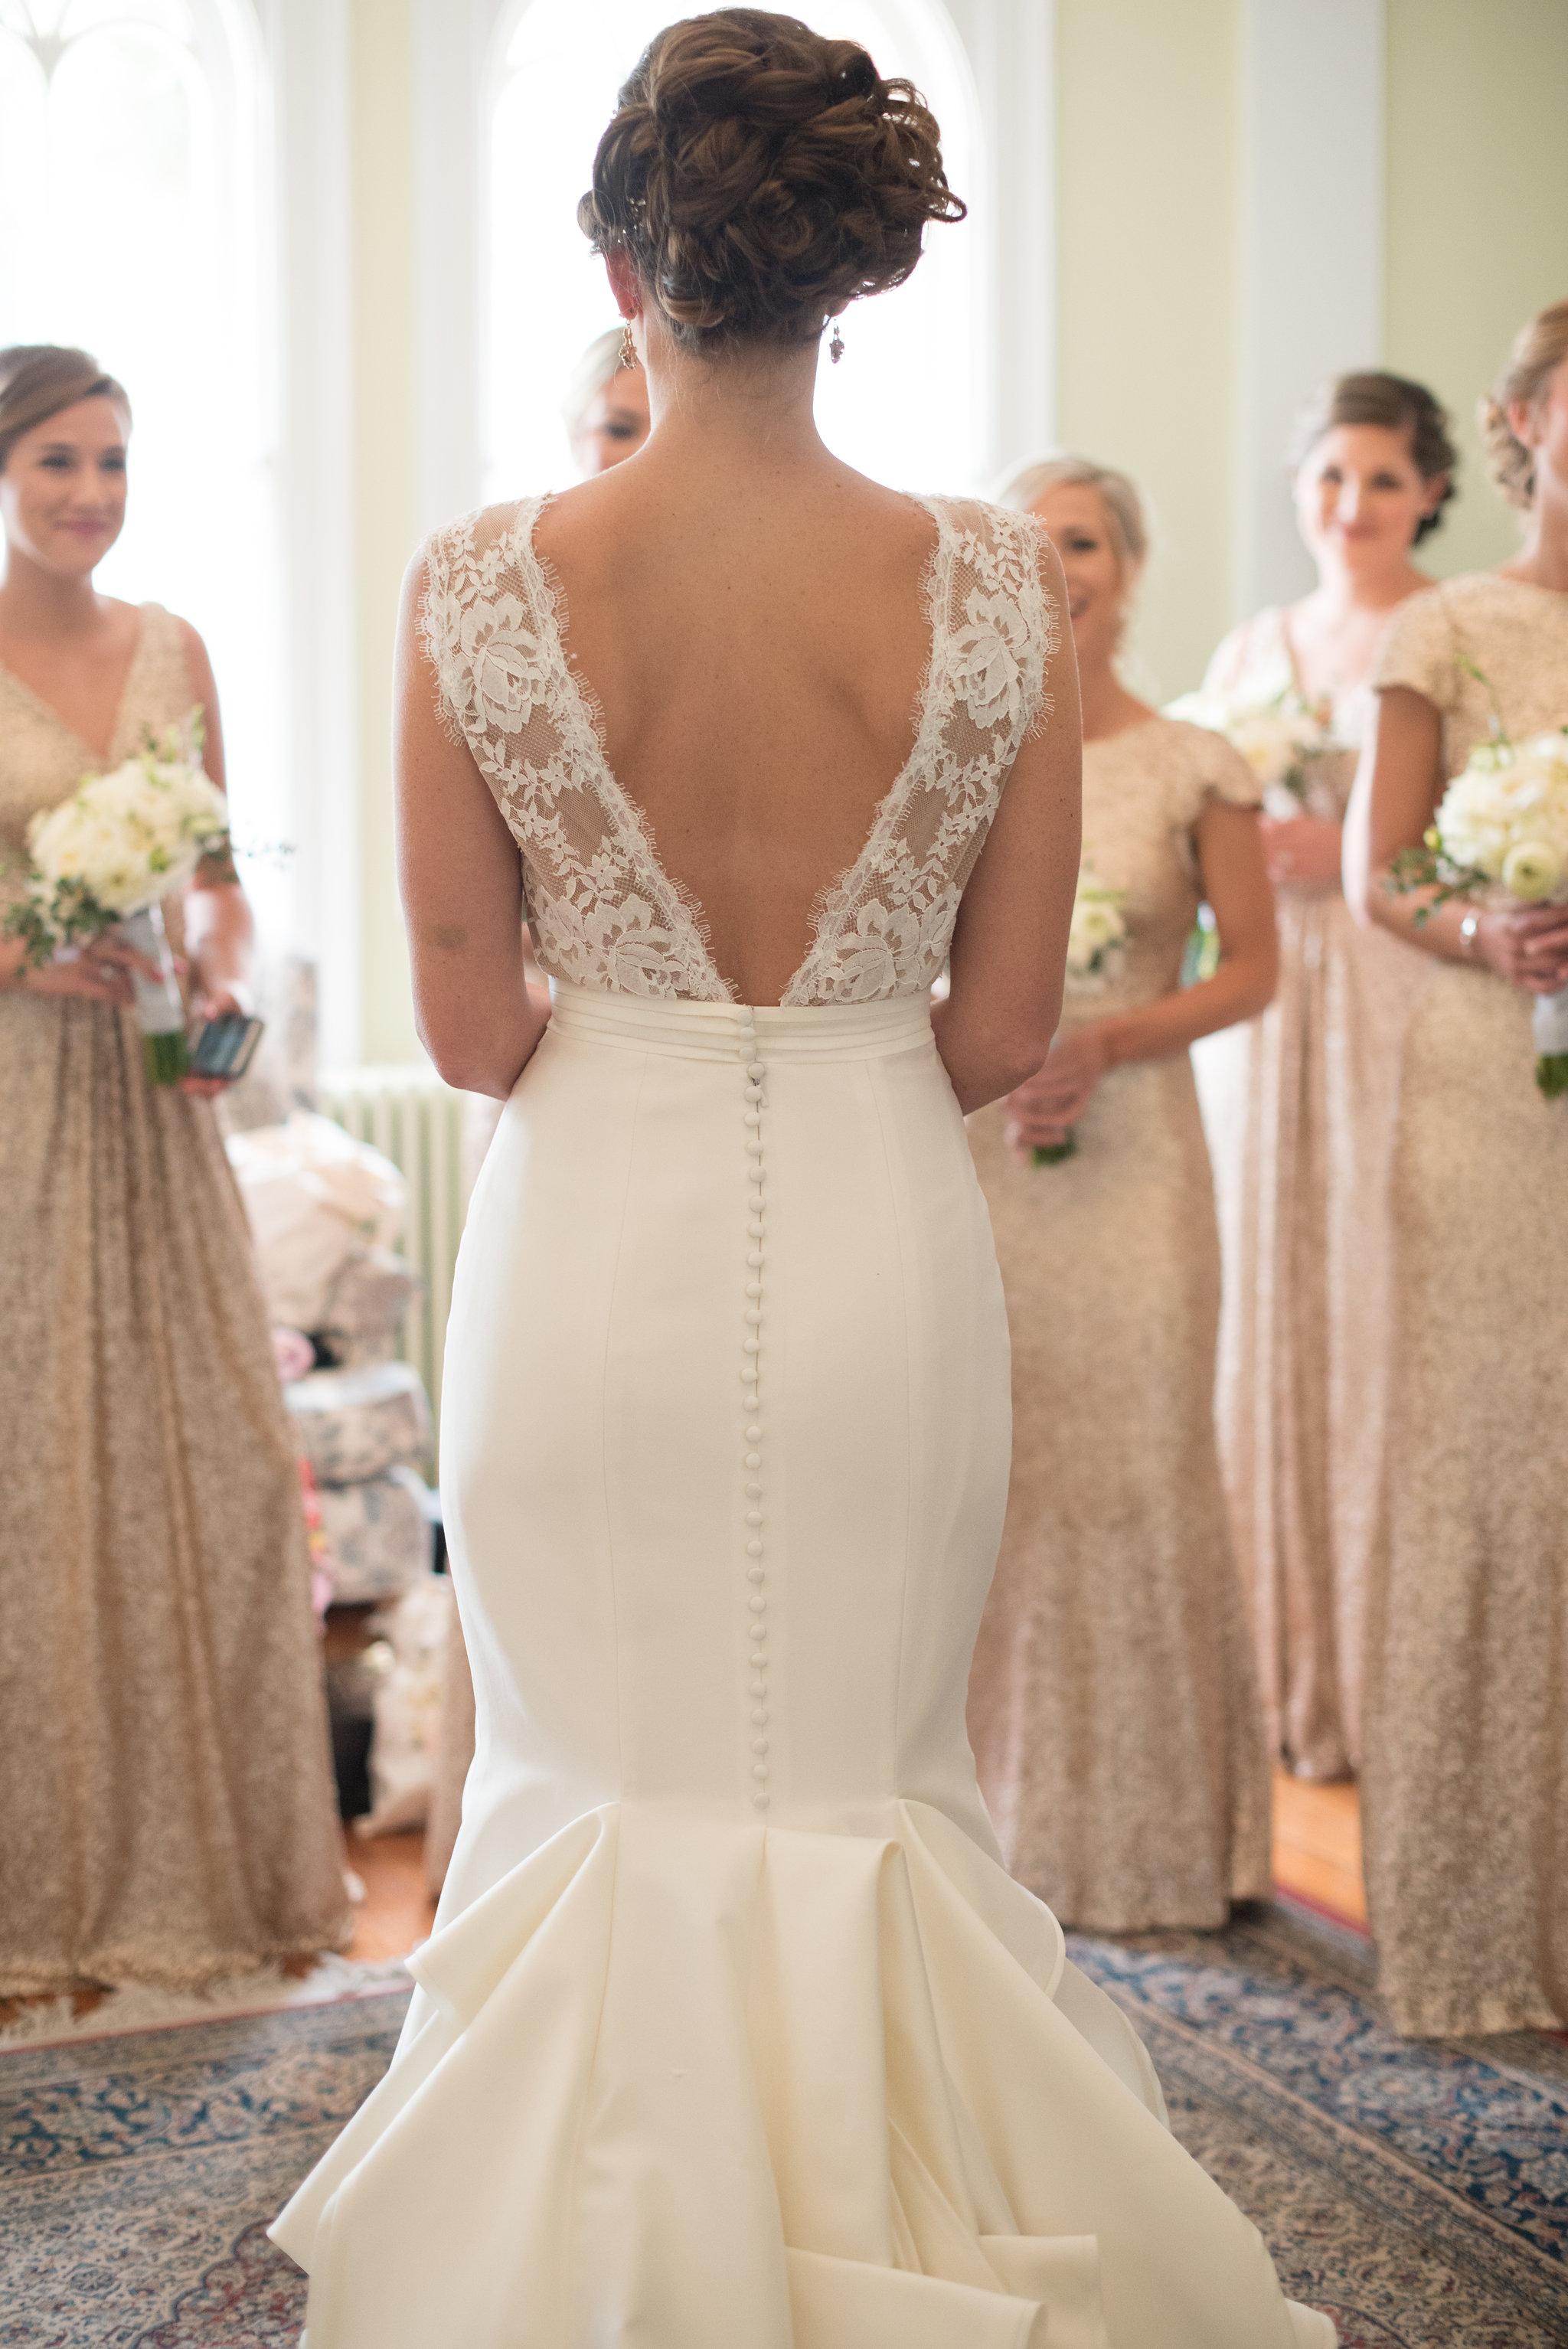 st-augustine-wedding-photographer-sarah-annay-photography.jpg32.jpg